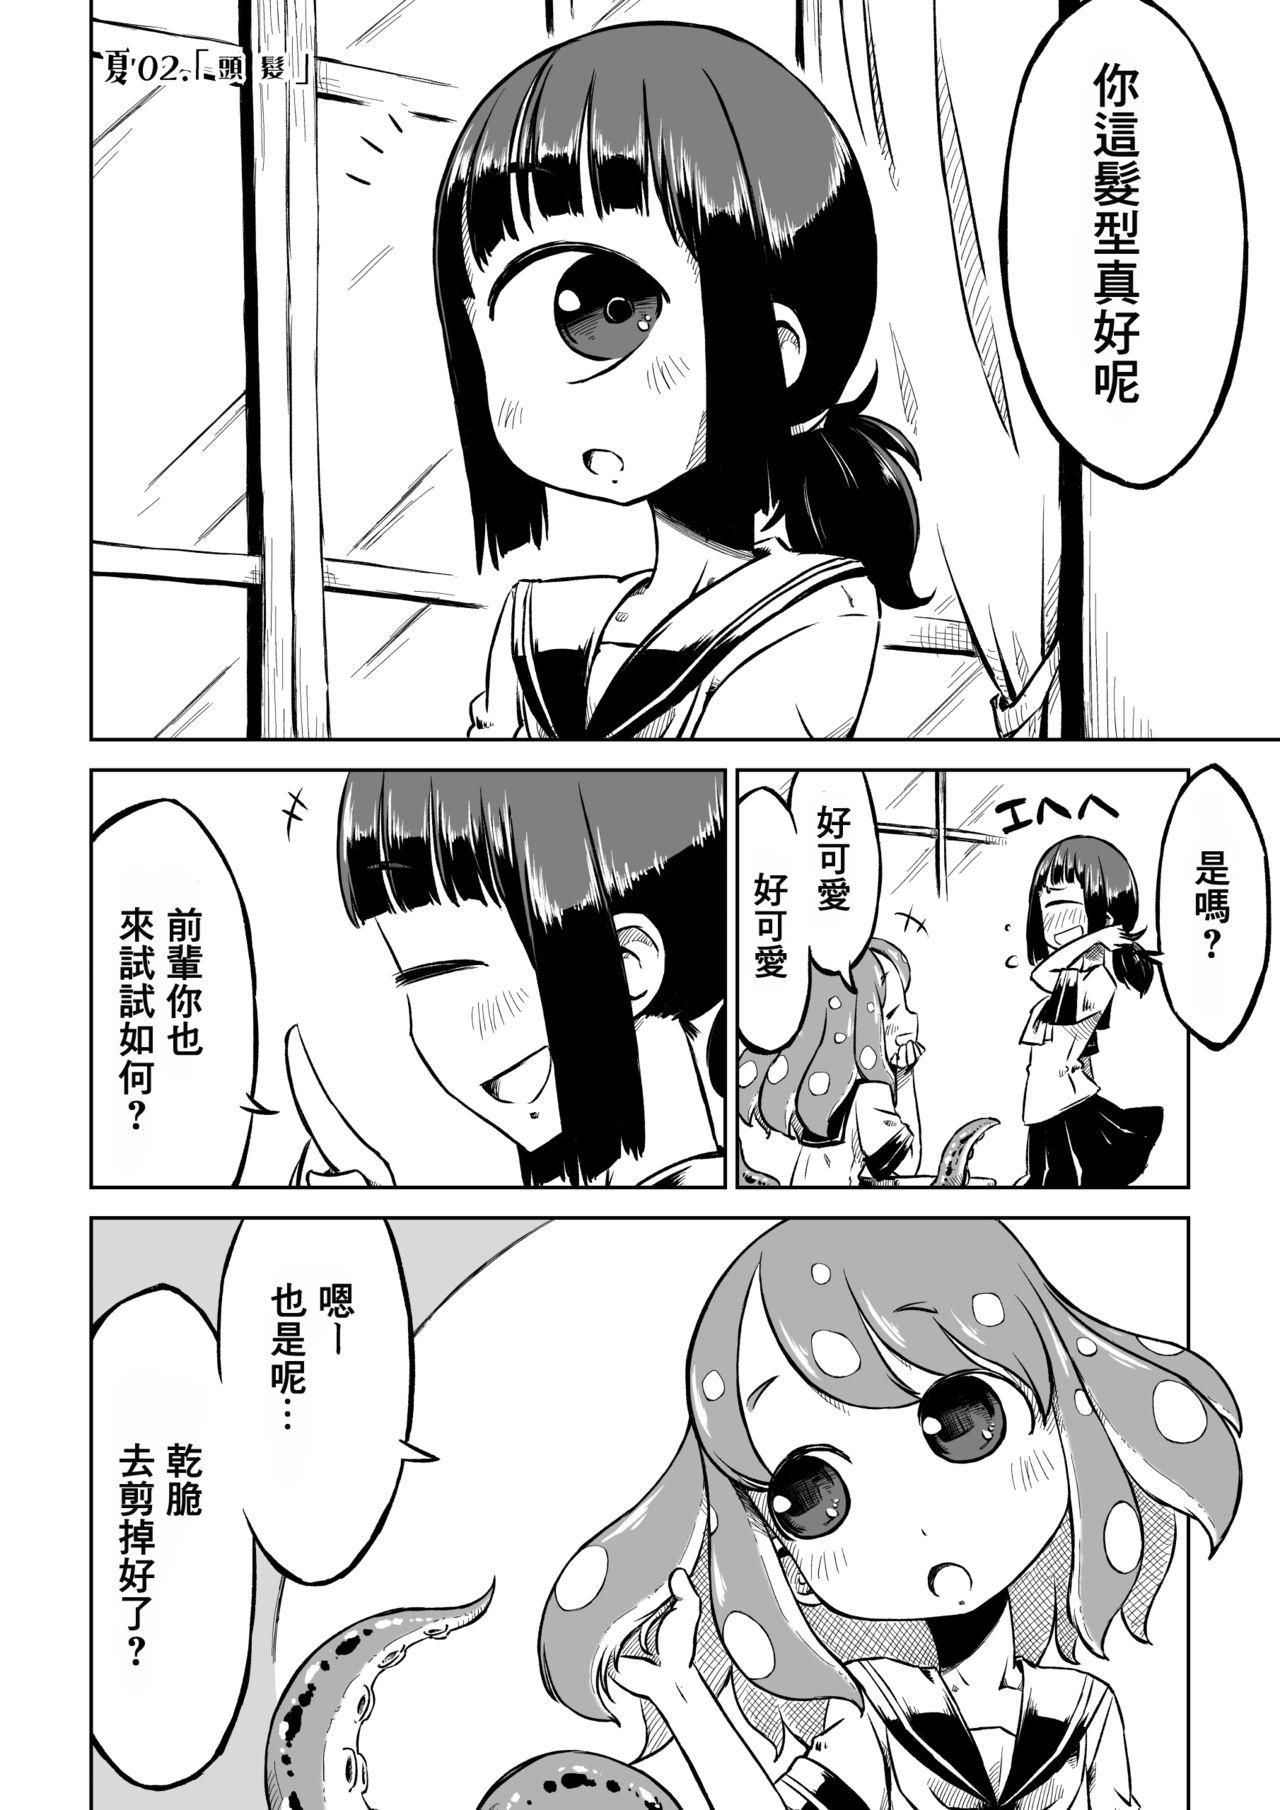 Tako Musume to Tangan Musume ga XX Suru dake. 8